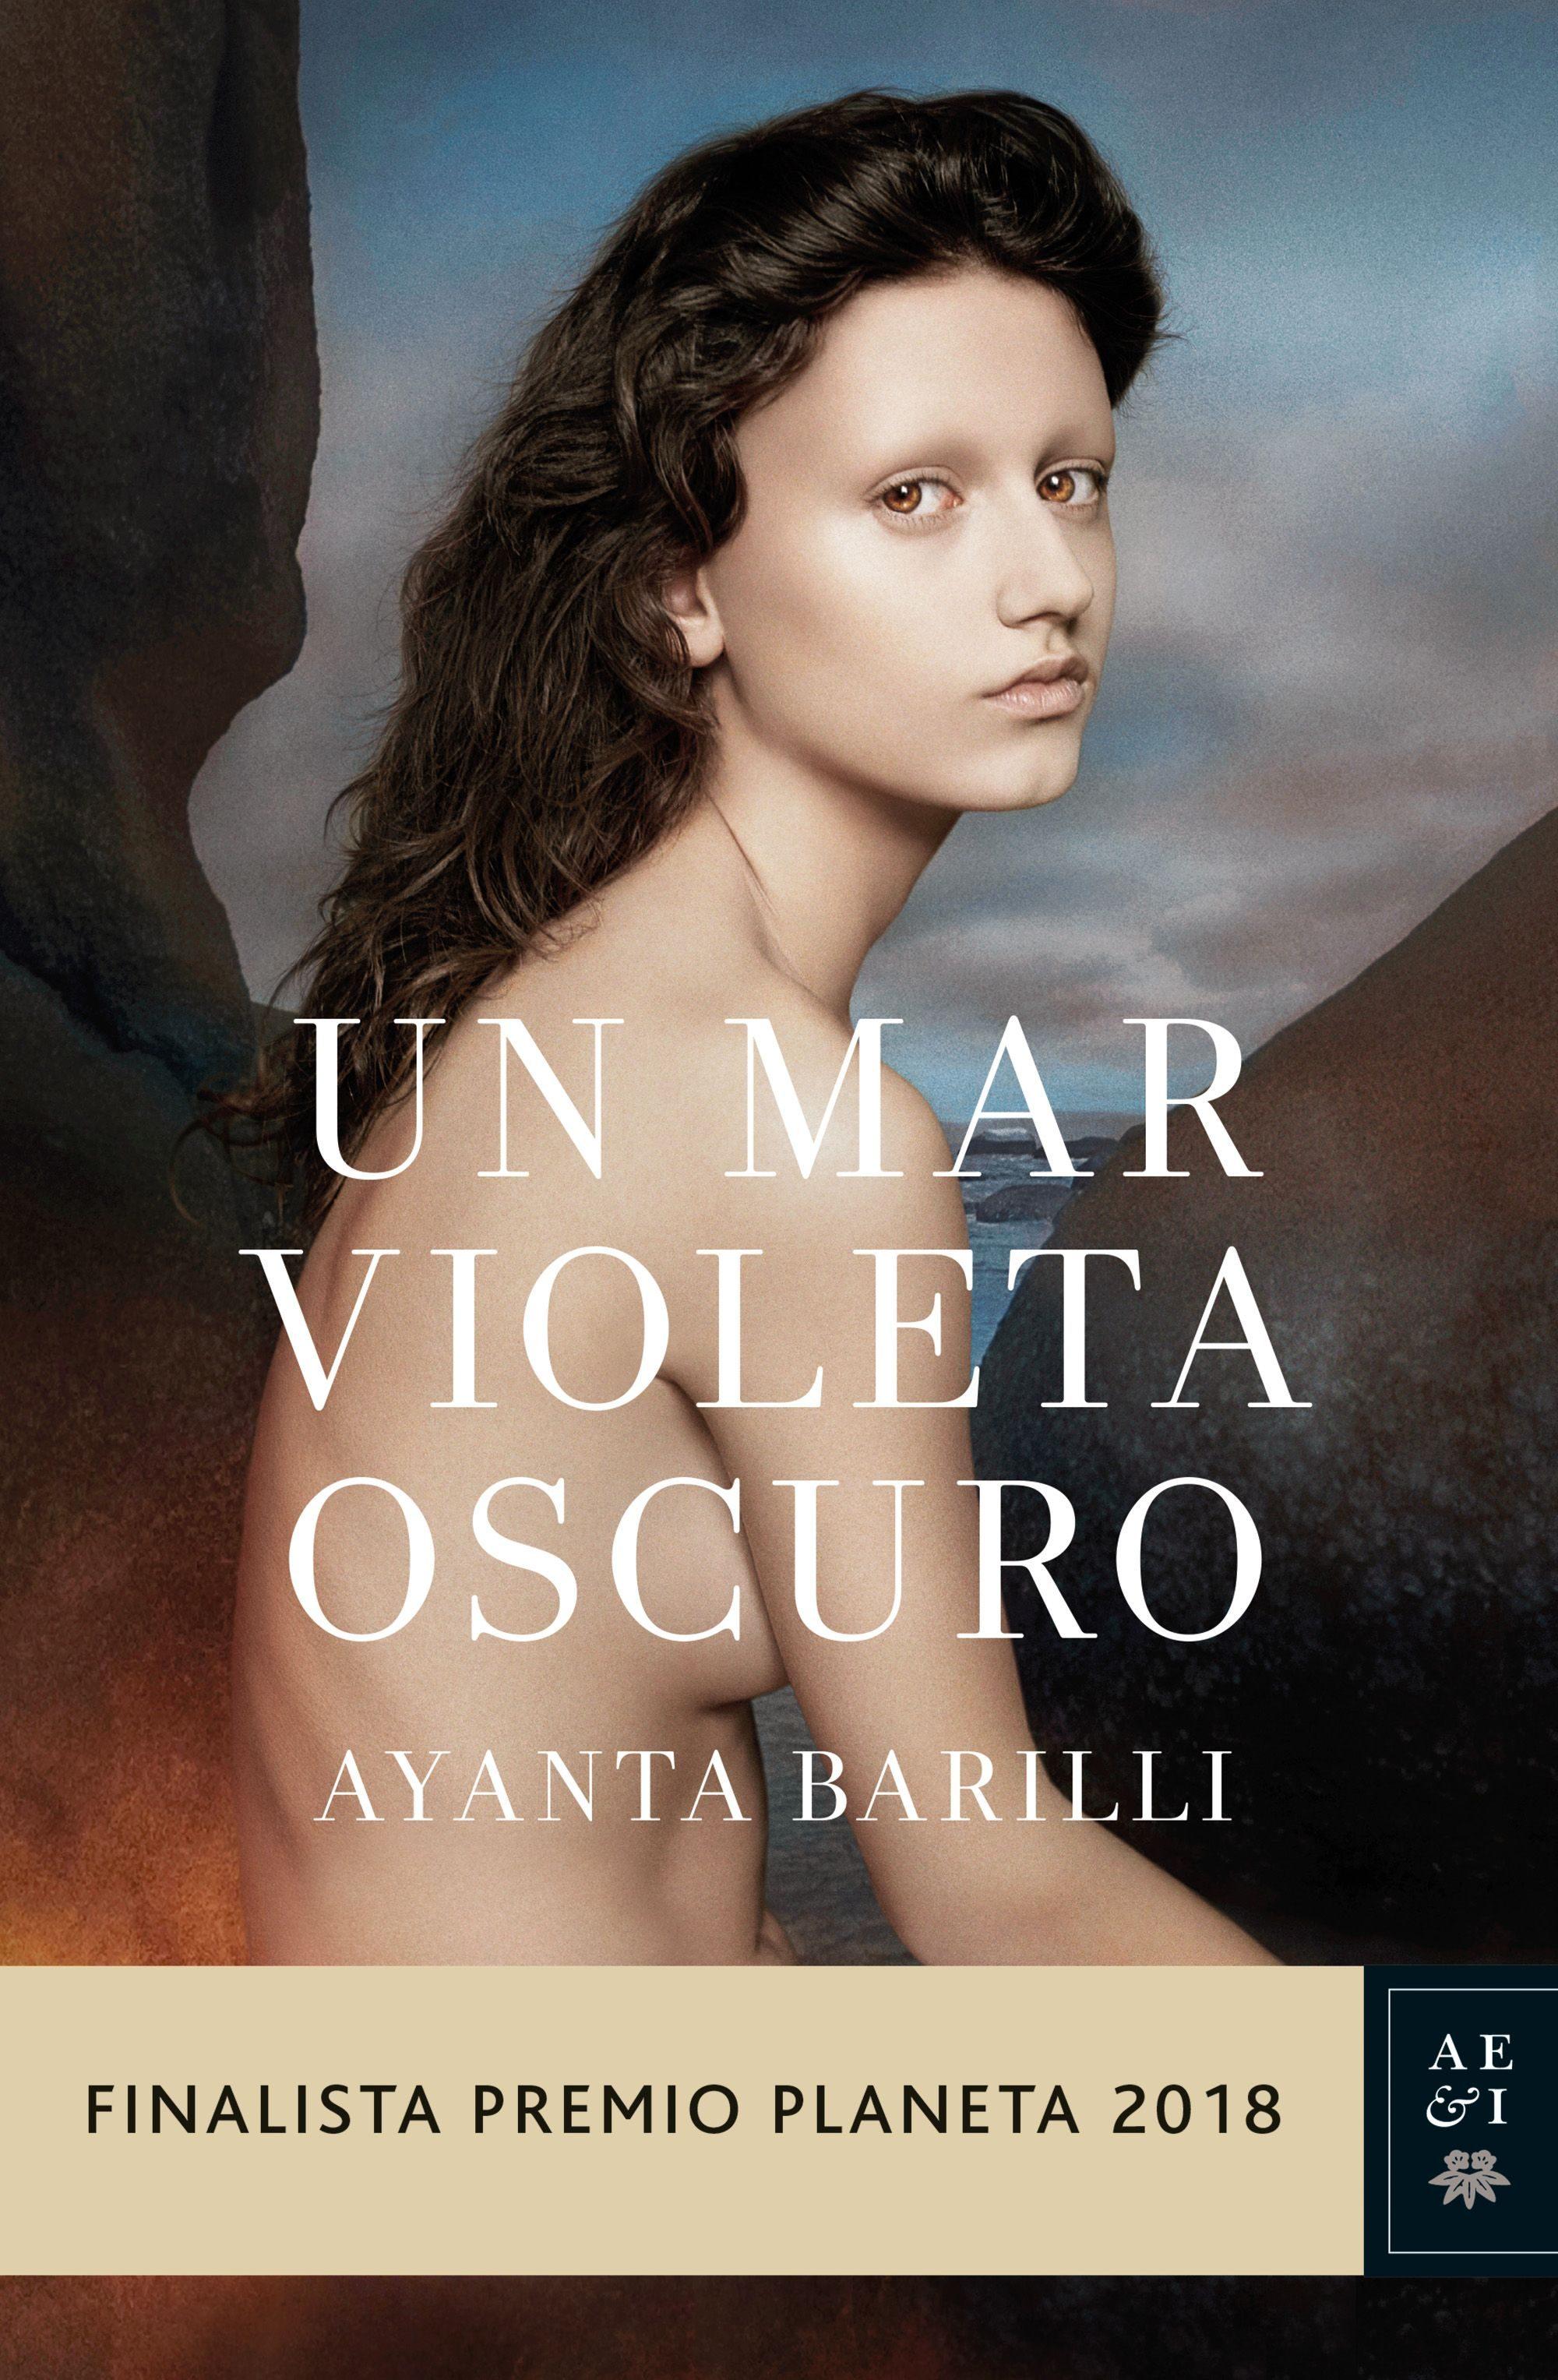 Un mar violeta oscuro (Ayanta Barilli, 2018)